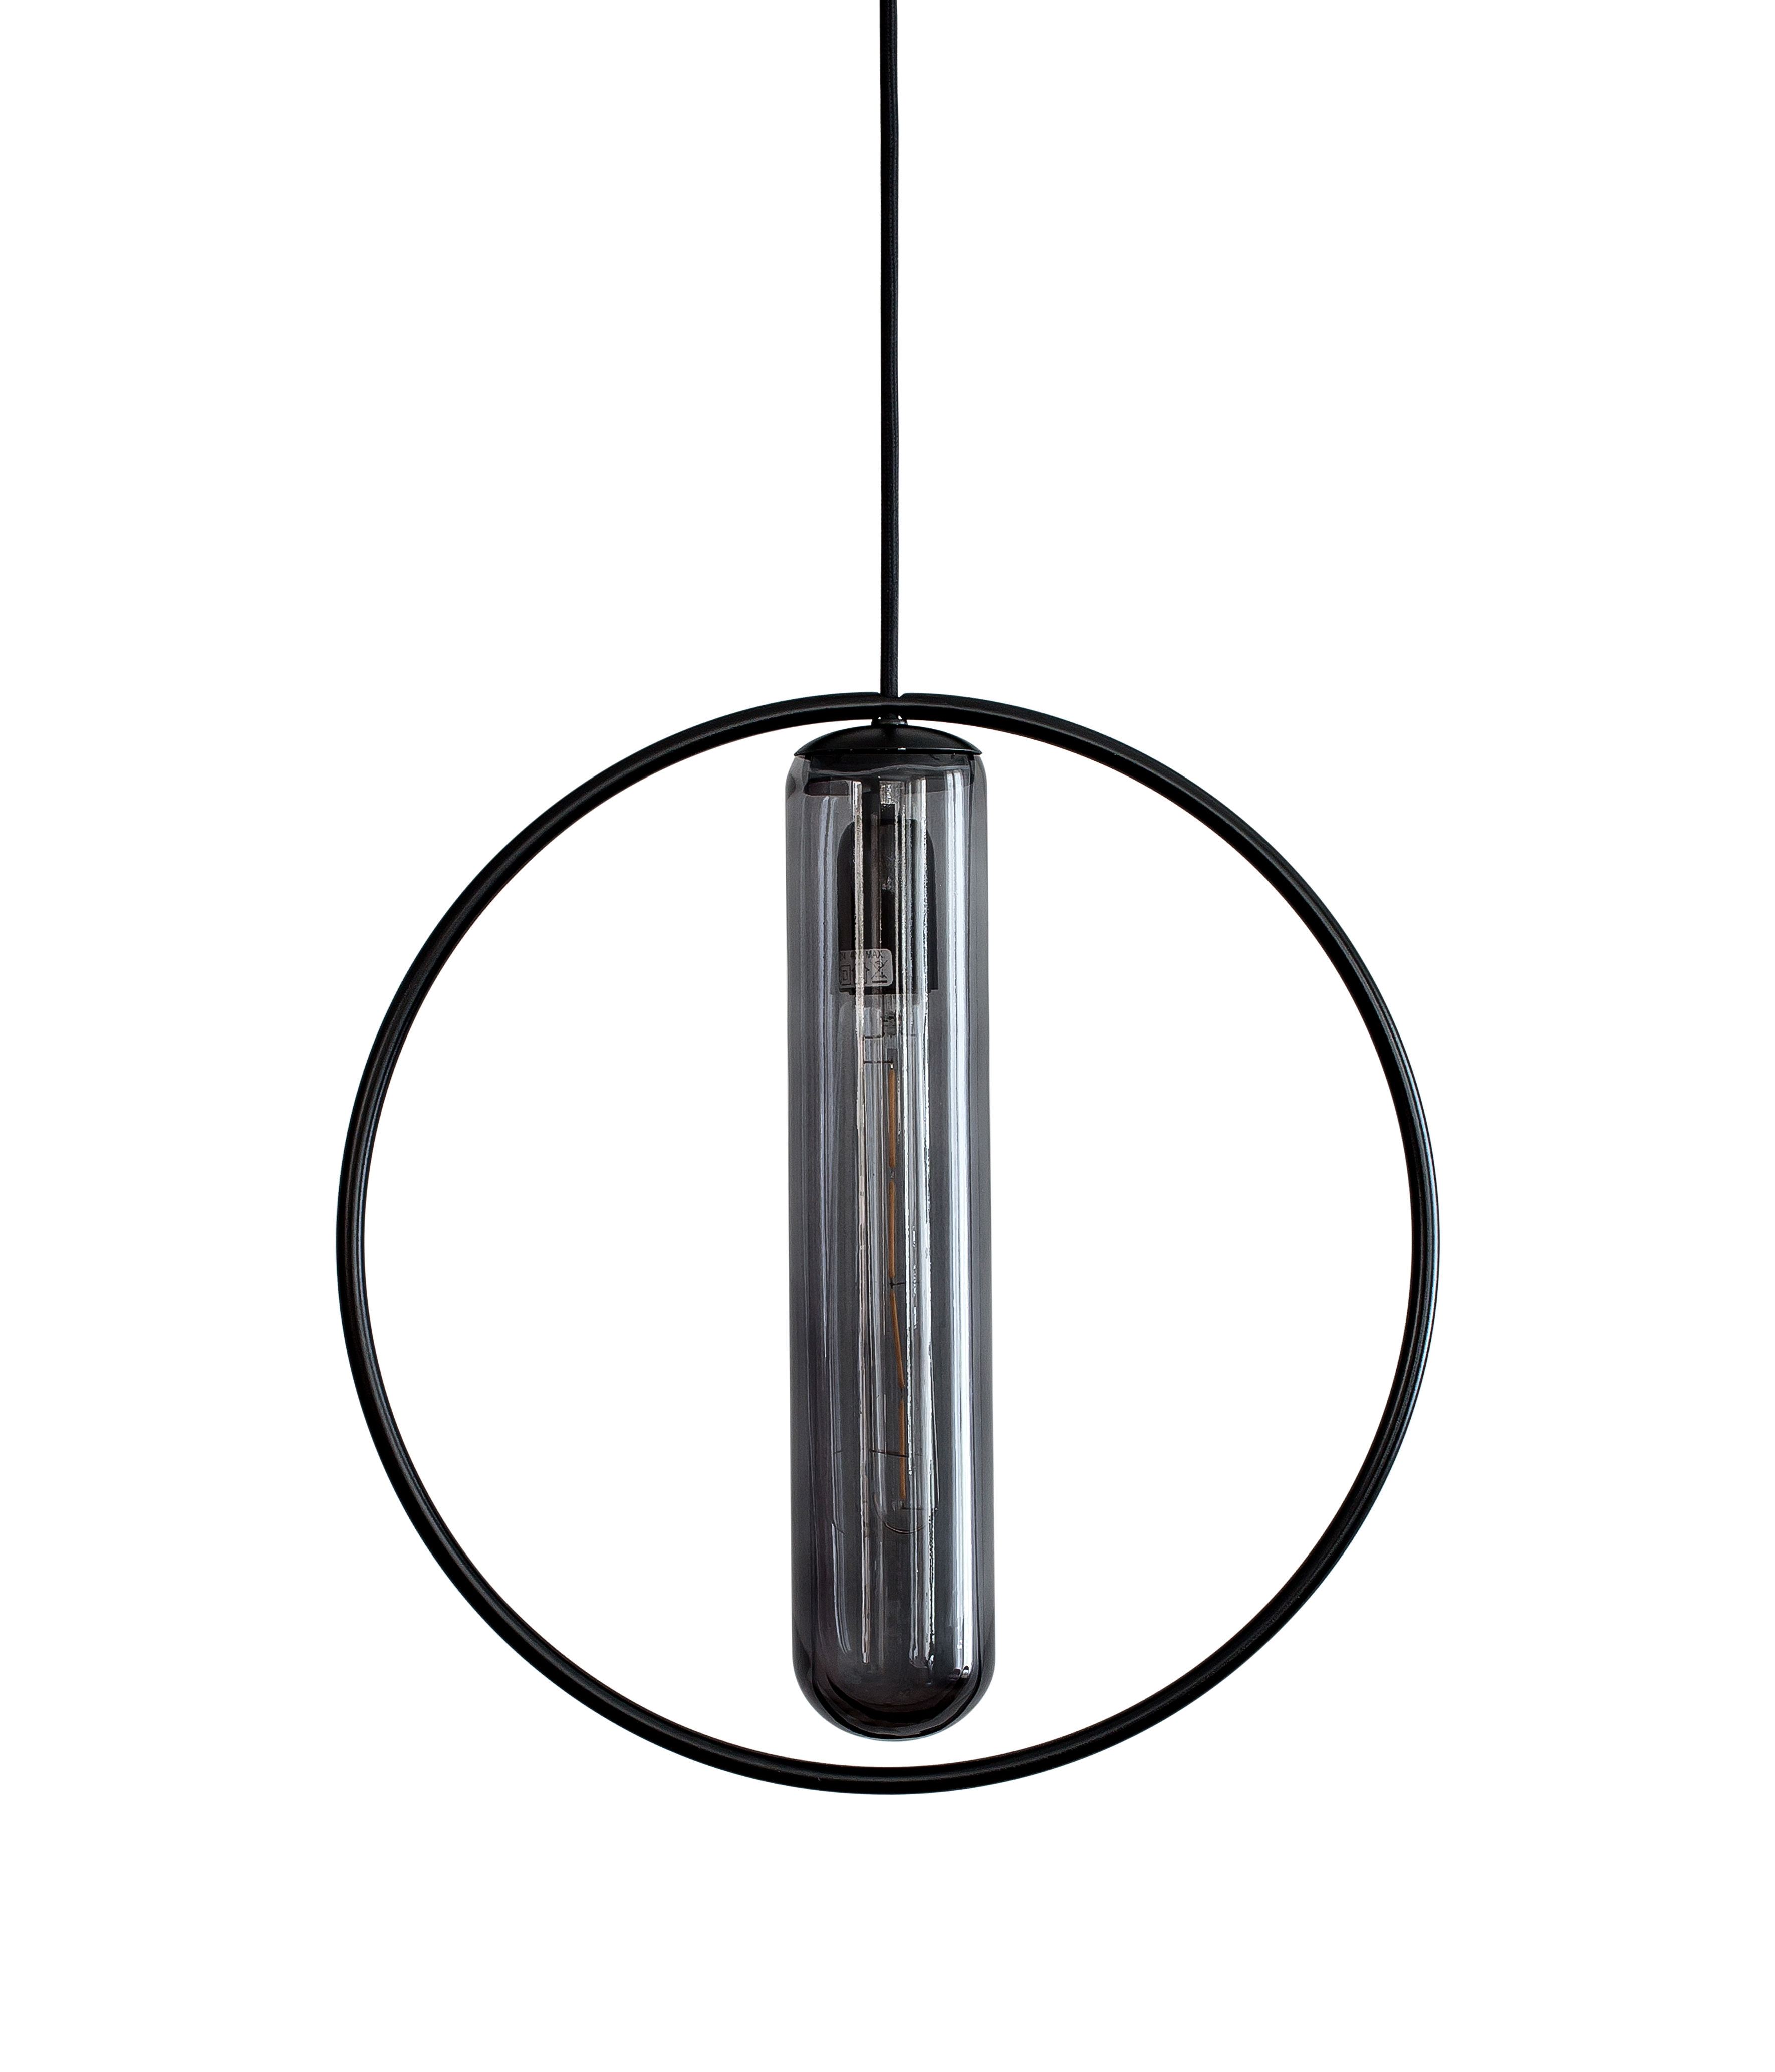 Lighting - Pendant Lighting - Astrée Pendant - / Ø 36 cm by Hartô - Black - Blown glass, Lacquered metal